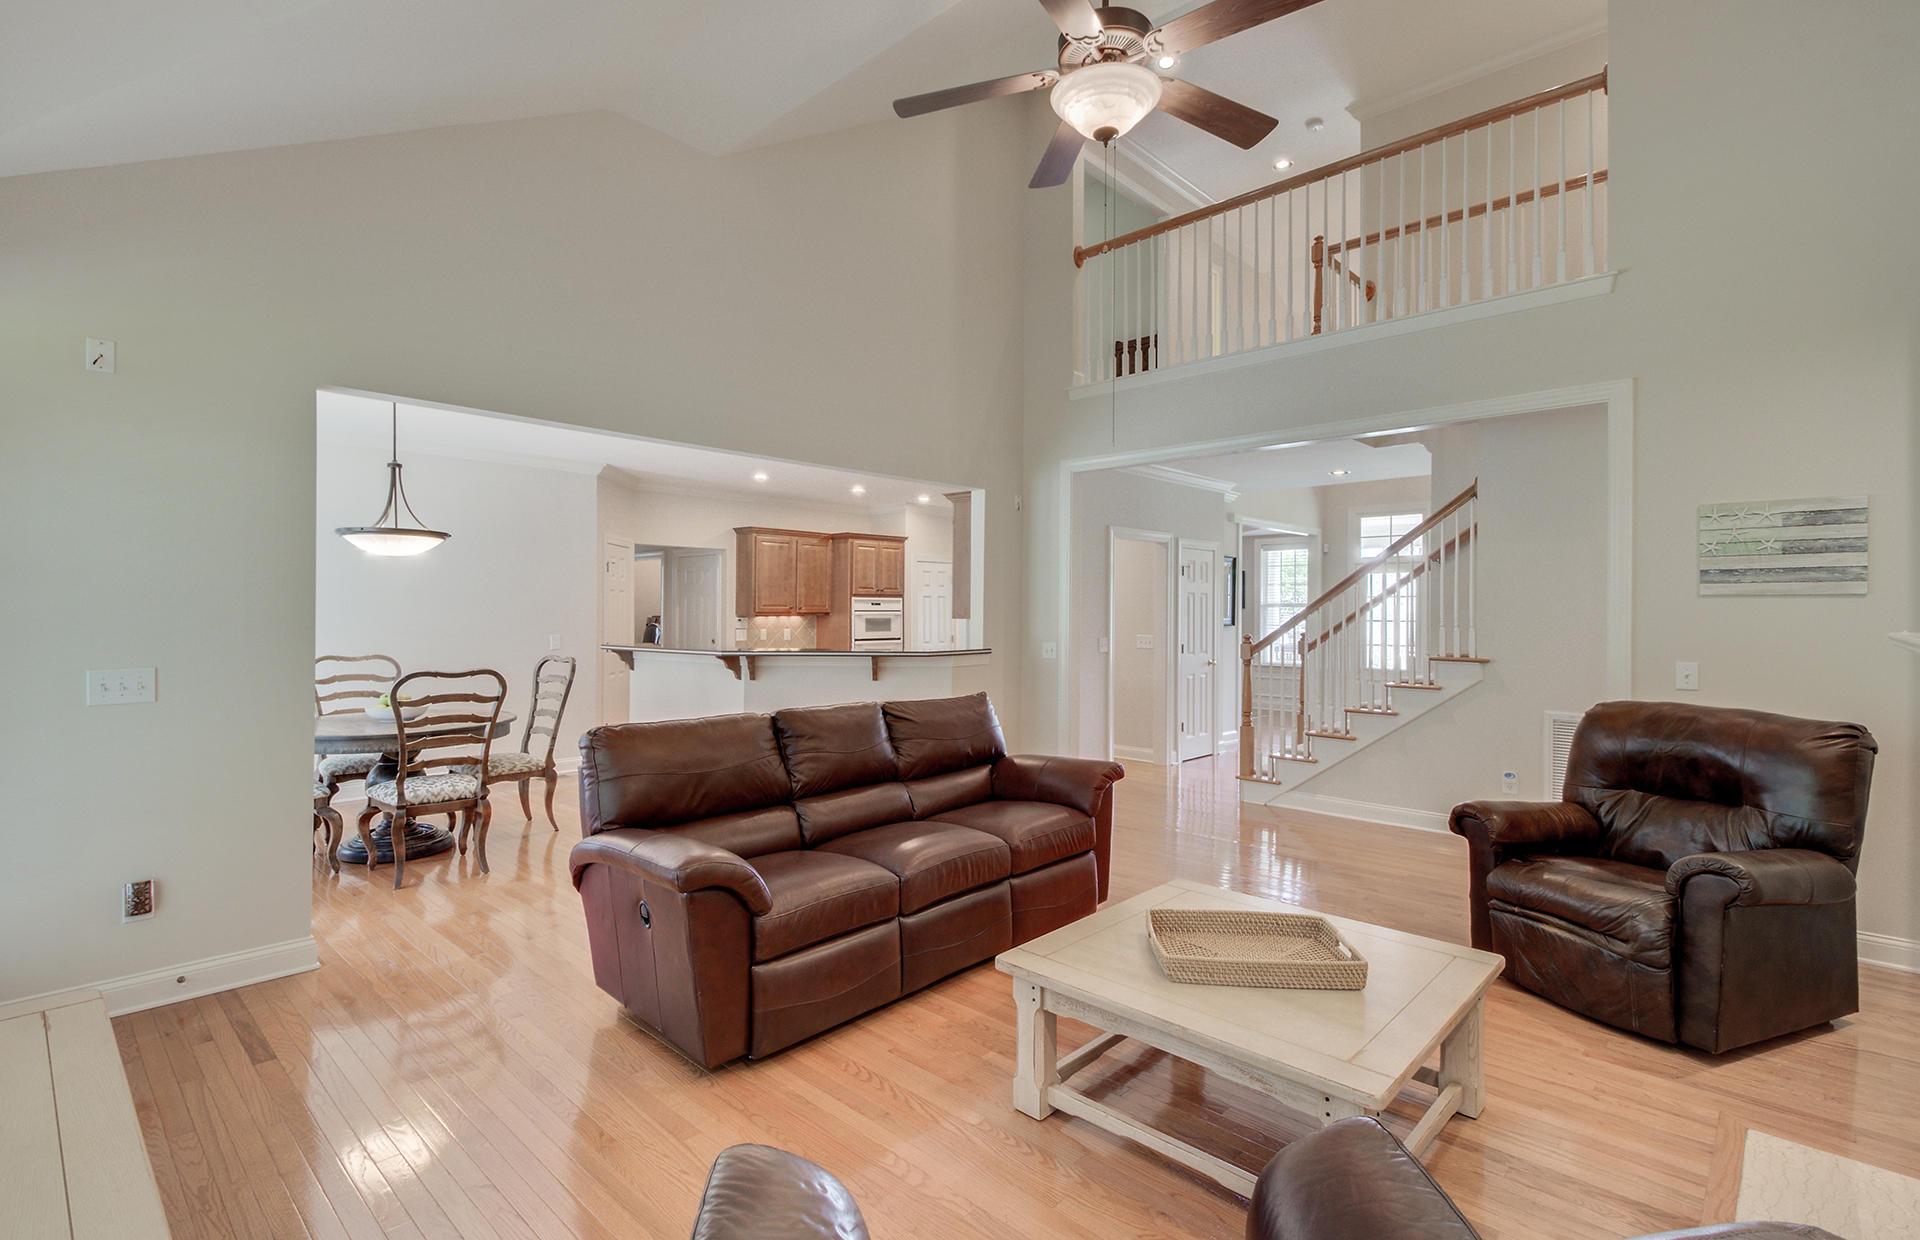 Dunes West Homes For Sale - 2453 Darts Cove, Mount Pleasant, SC - 4